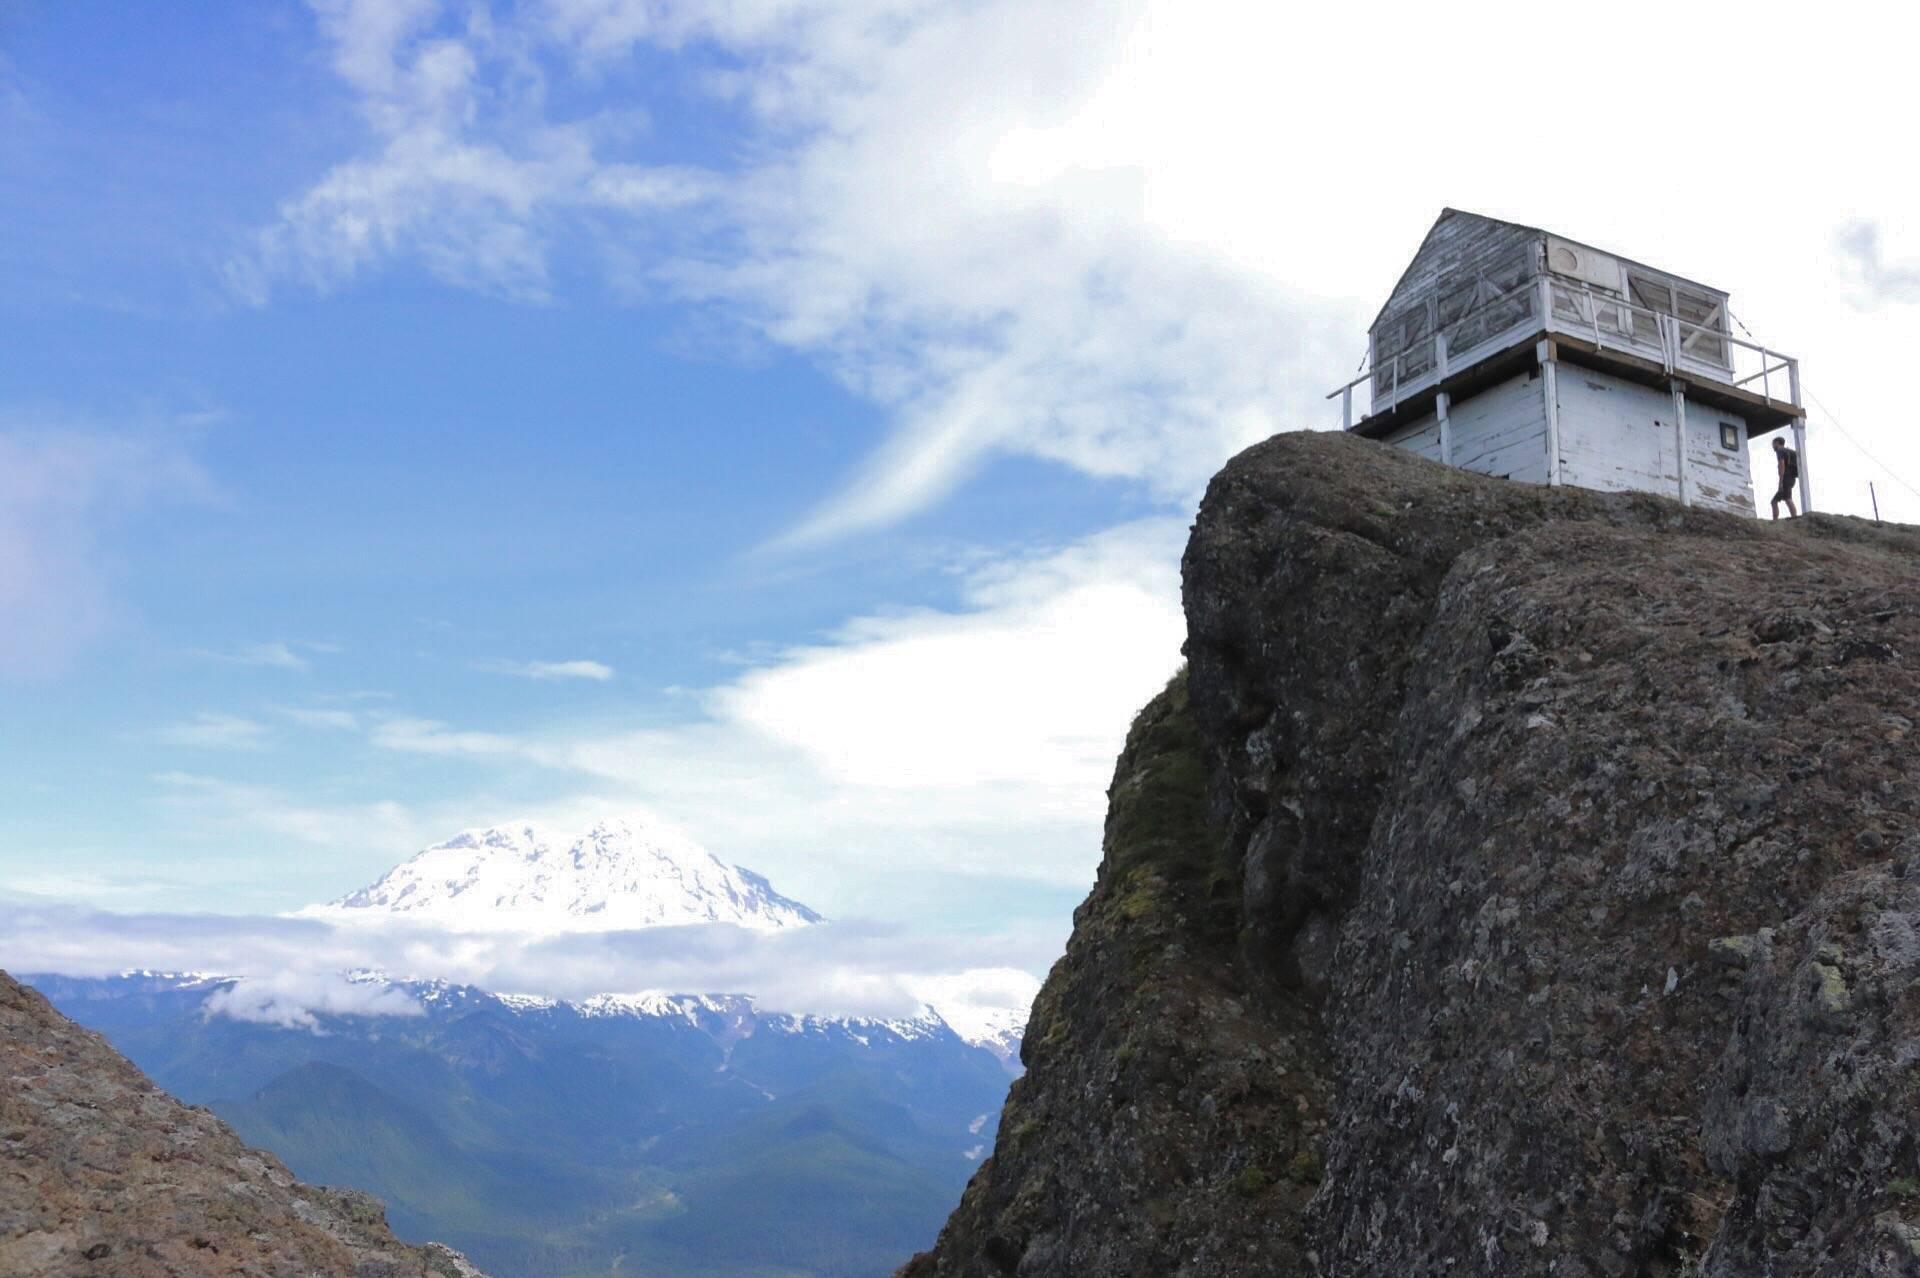 Top of High Rock Lookout near Mt. Rainer, WA